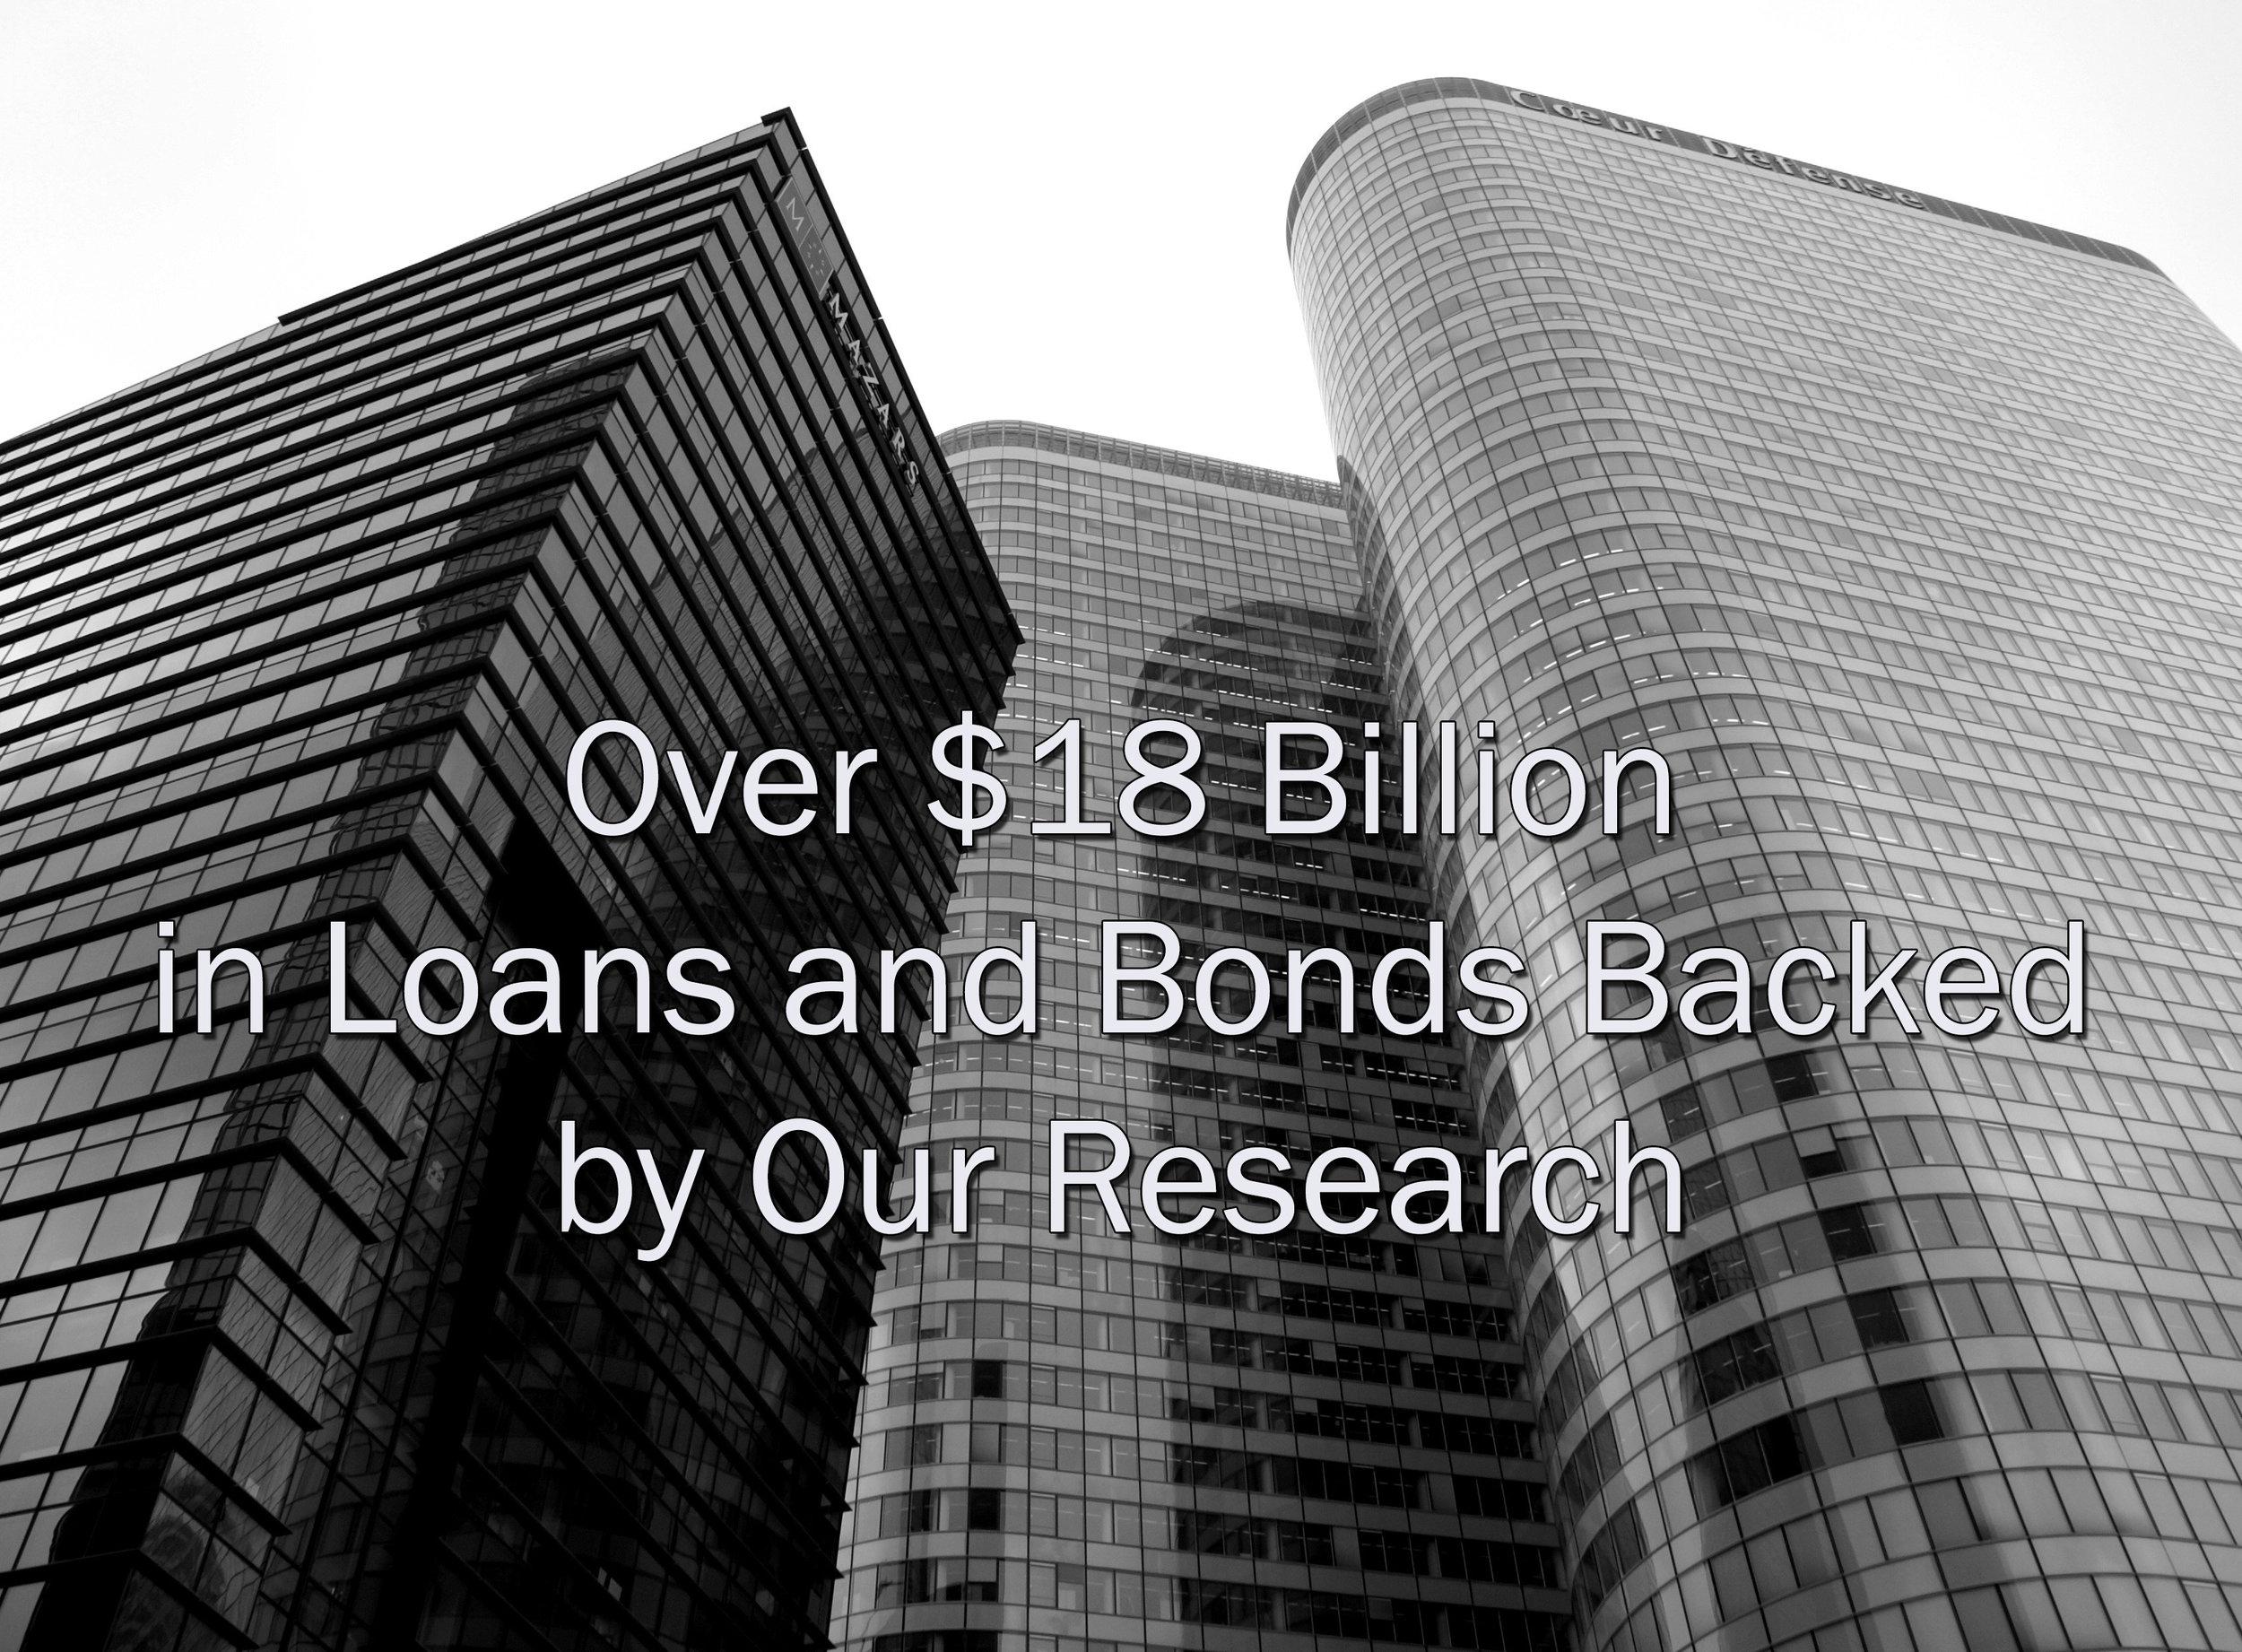 bonds-and-loans.jpg